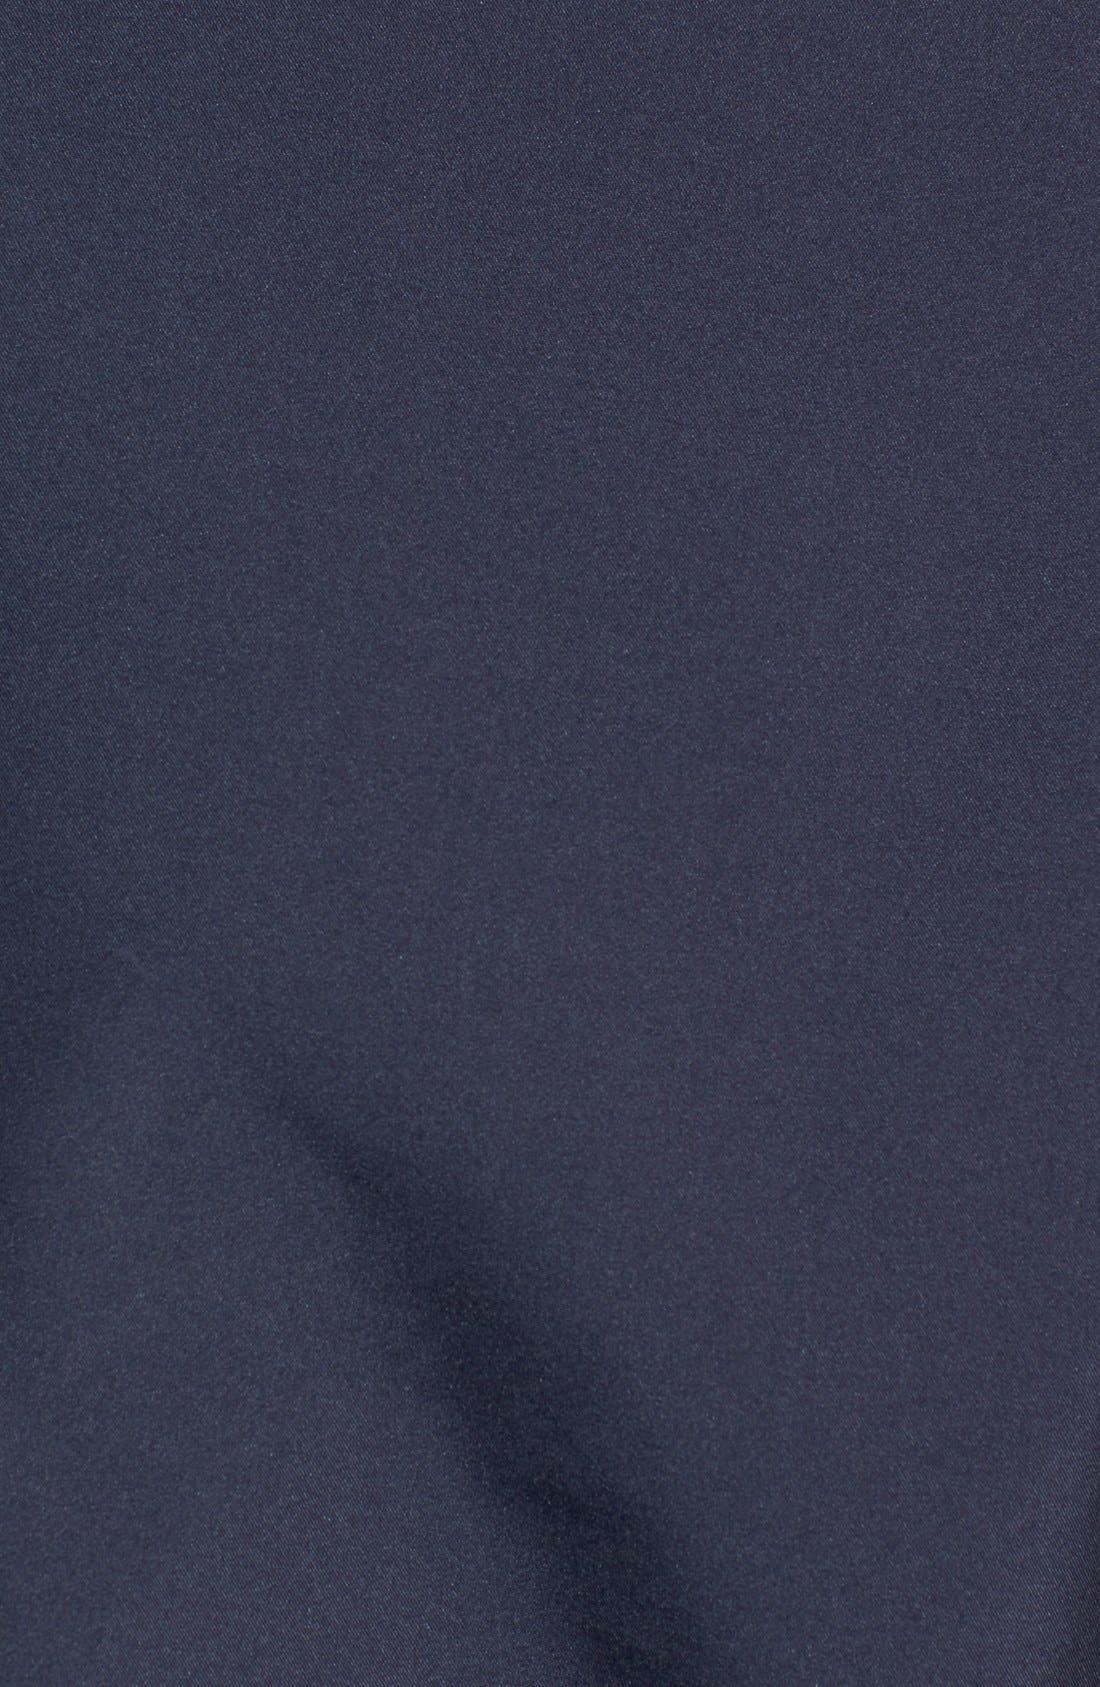 New England Patriots - Beacon WeatherTec Wind & Water Resistant Jacket,                             Alternate thumbnail 2, color,                             420